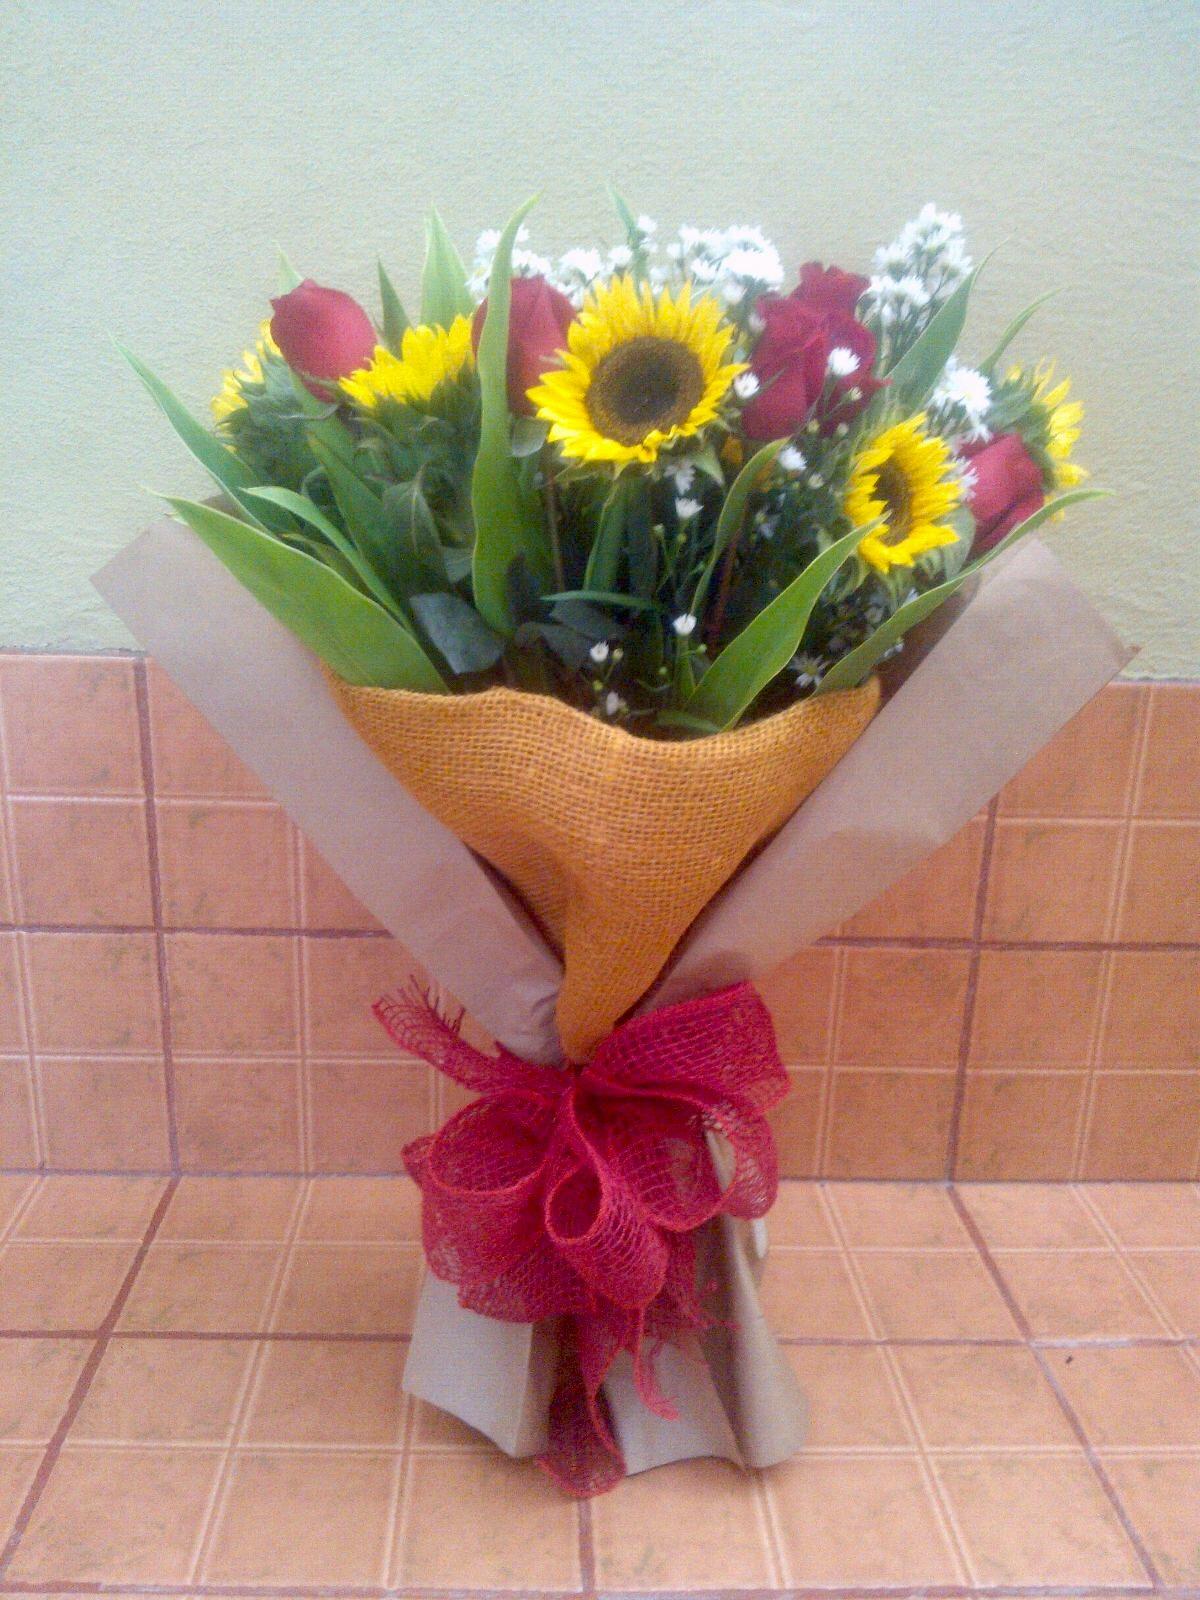 ramo de rosas - Imagenes De Ramos De Flores